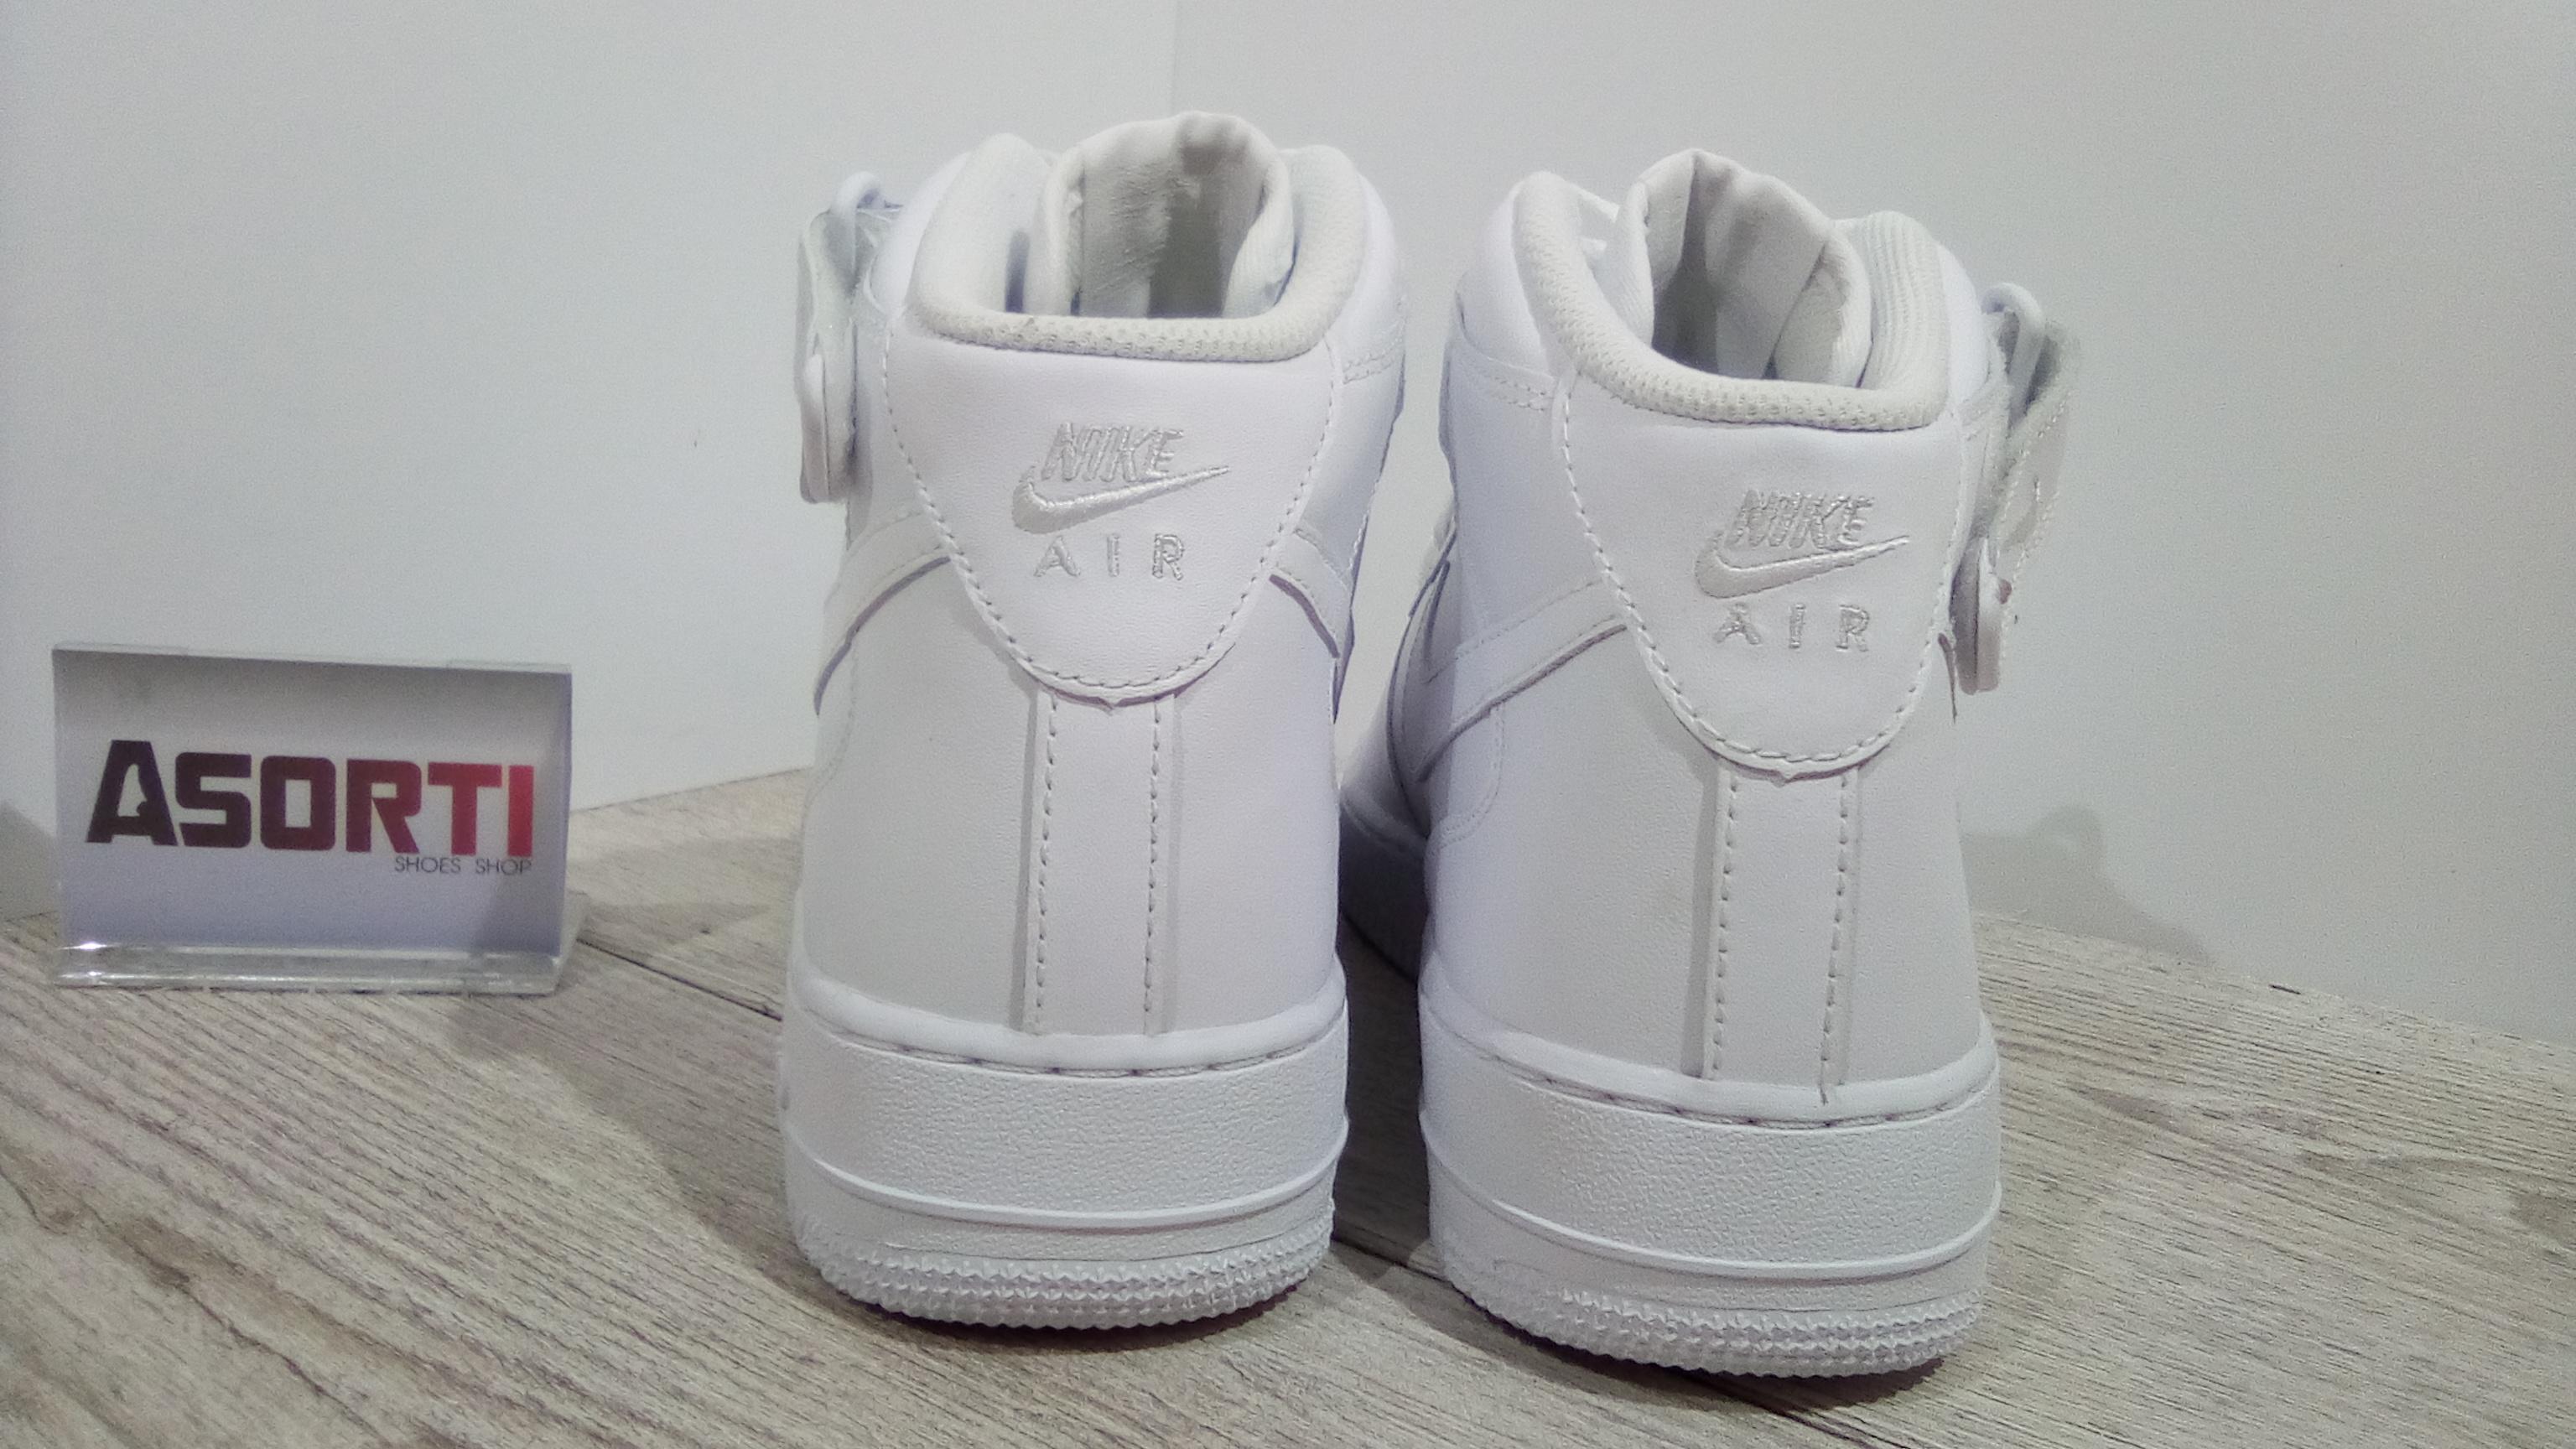 eaa4b2d034d466 Мужские кроссовки Nike Air Force 1 Mid White (315123-111) белые ...